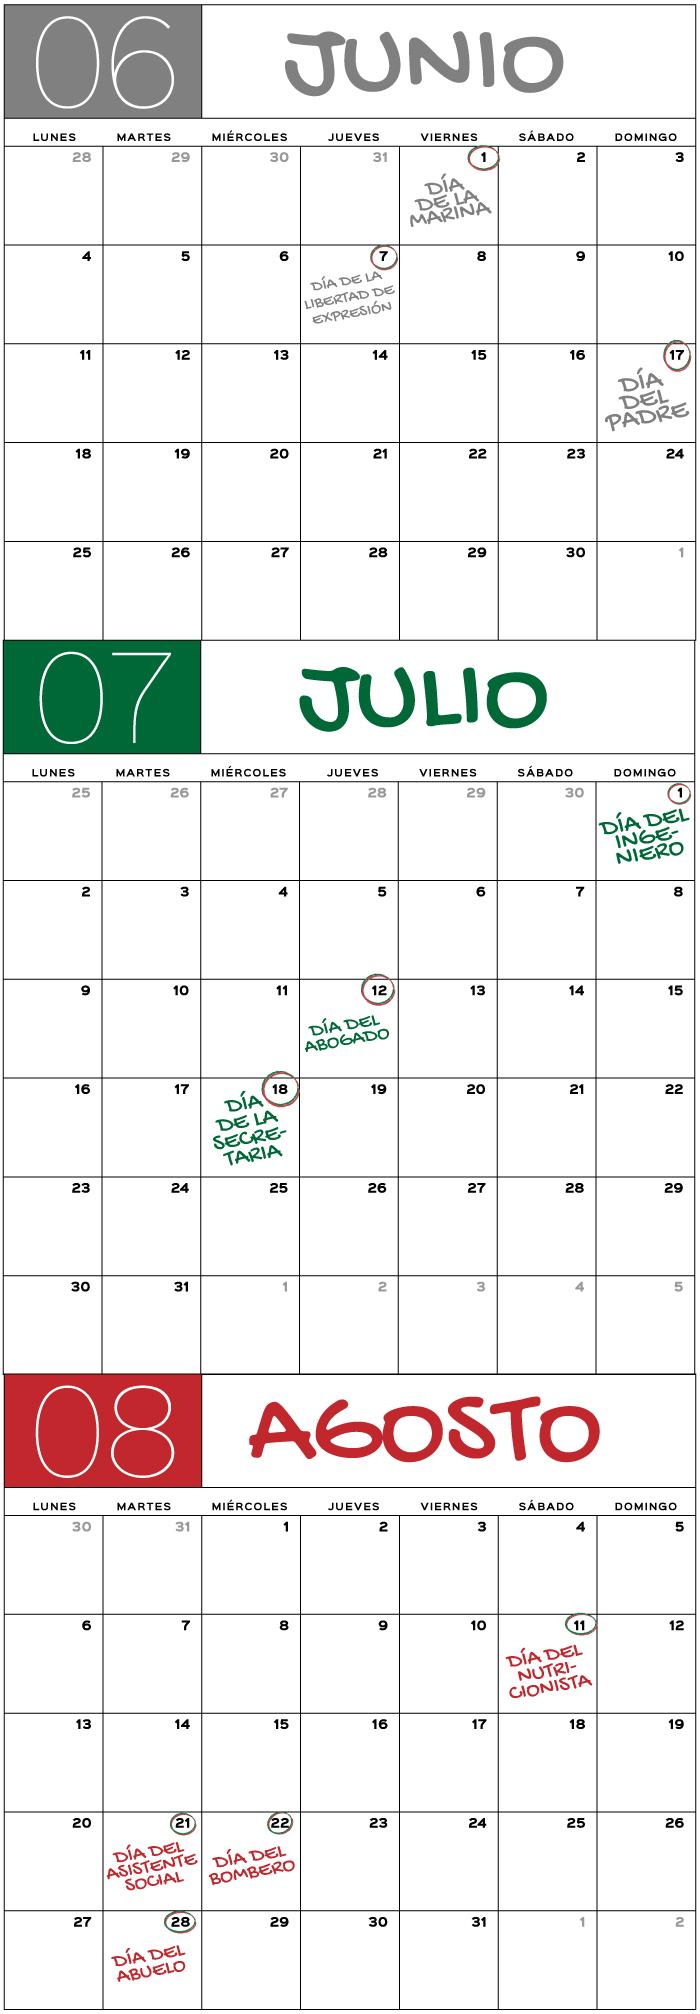 Info merchandising mexico junio julio agosto